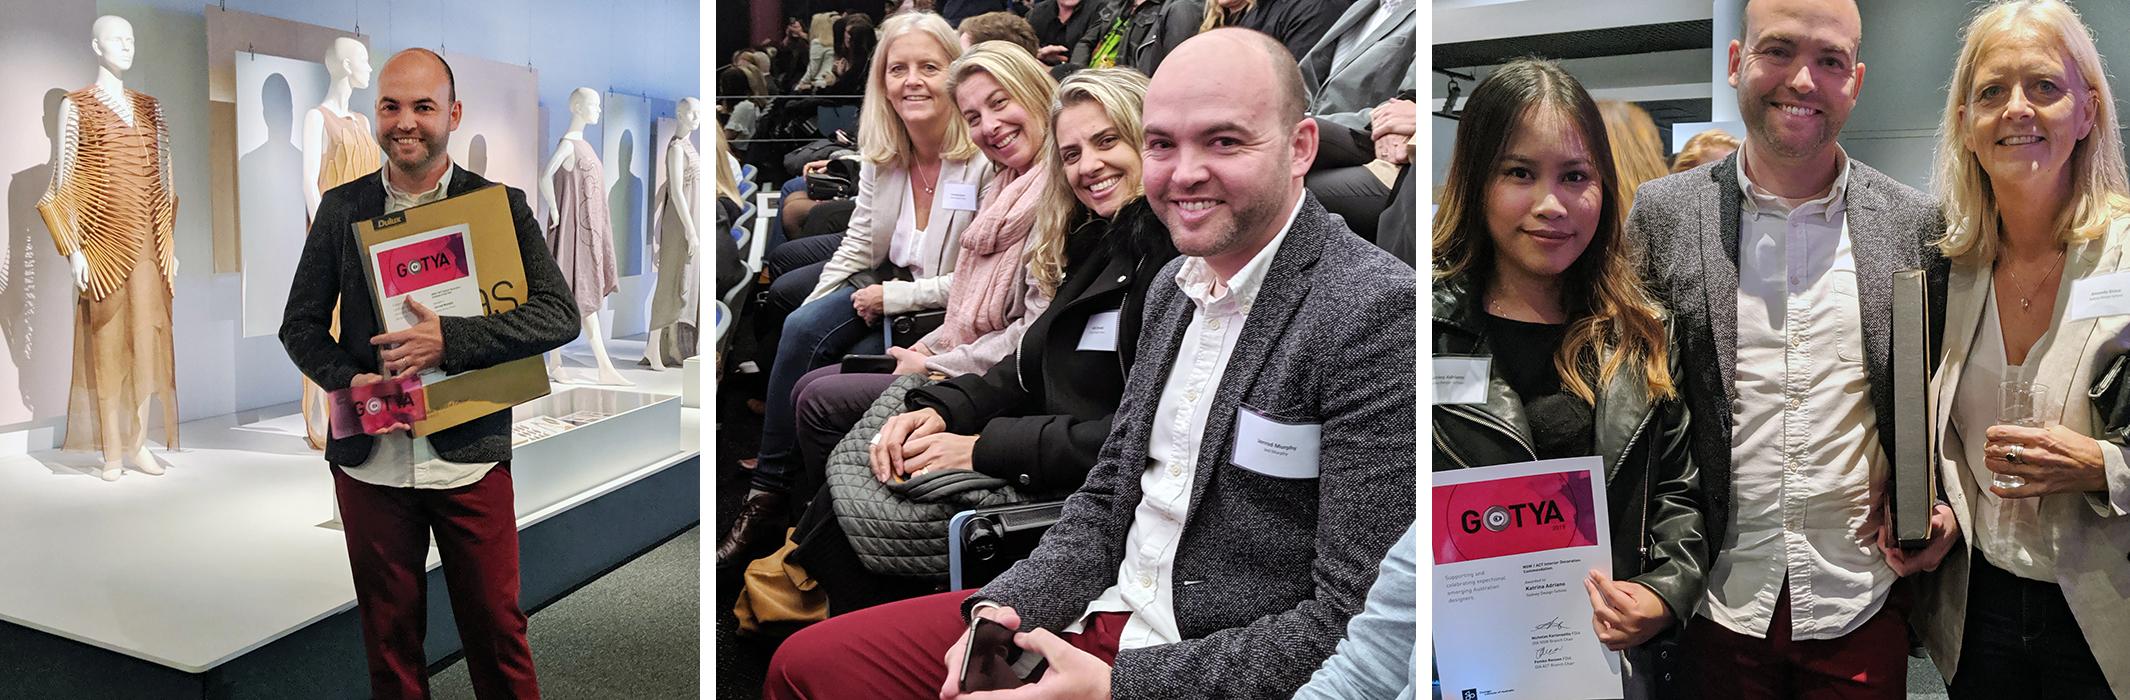 Sydney Design School students win at 2019 GOTYA Awards